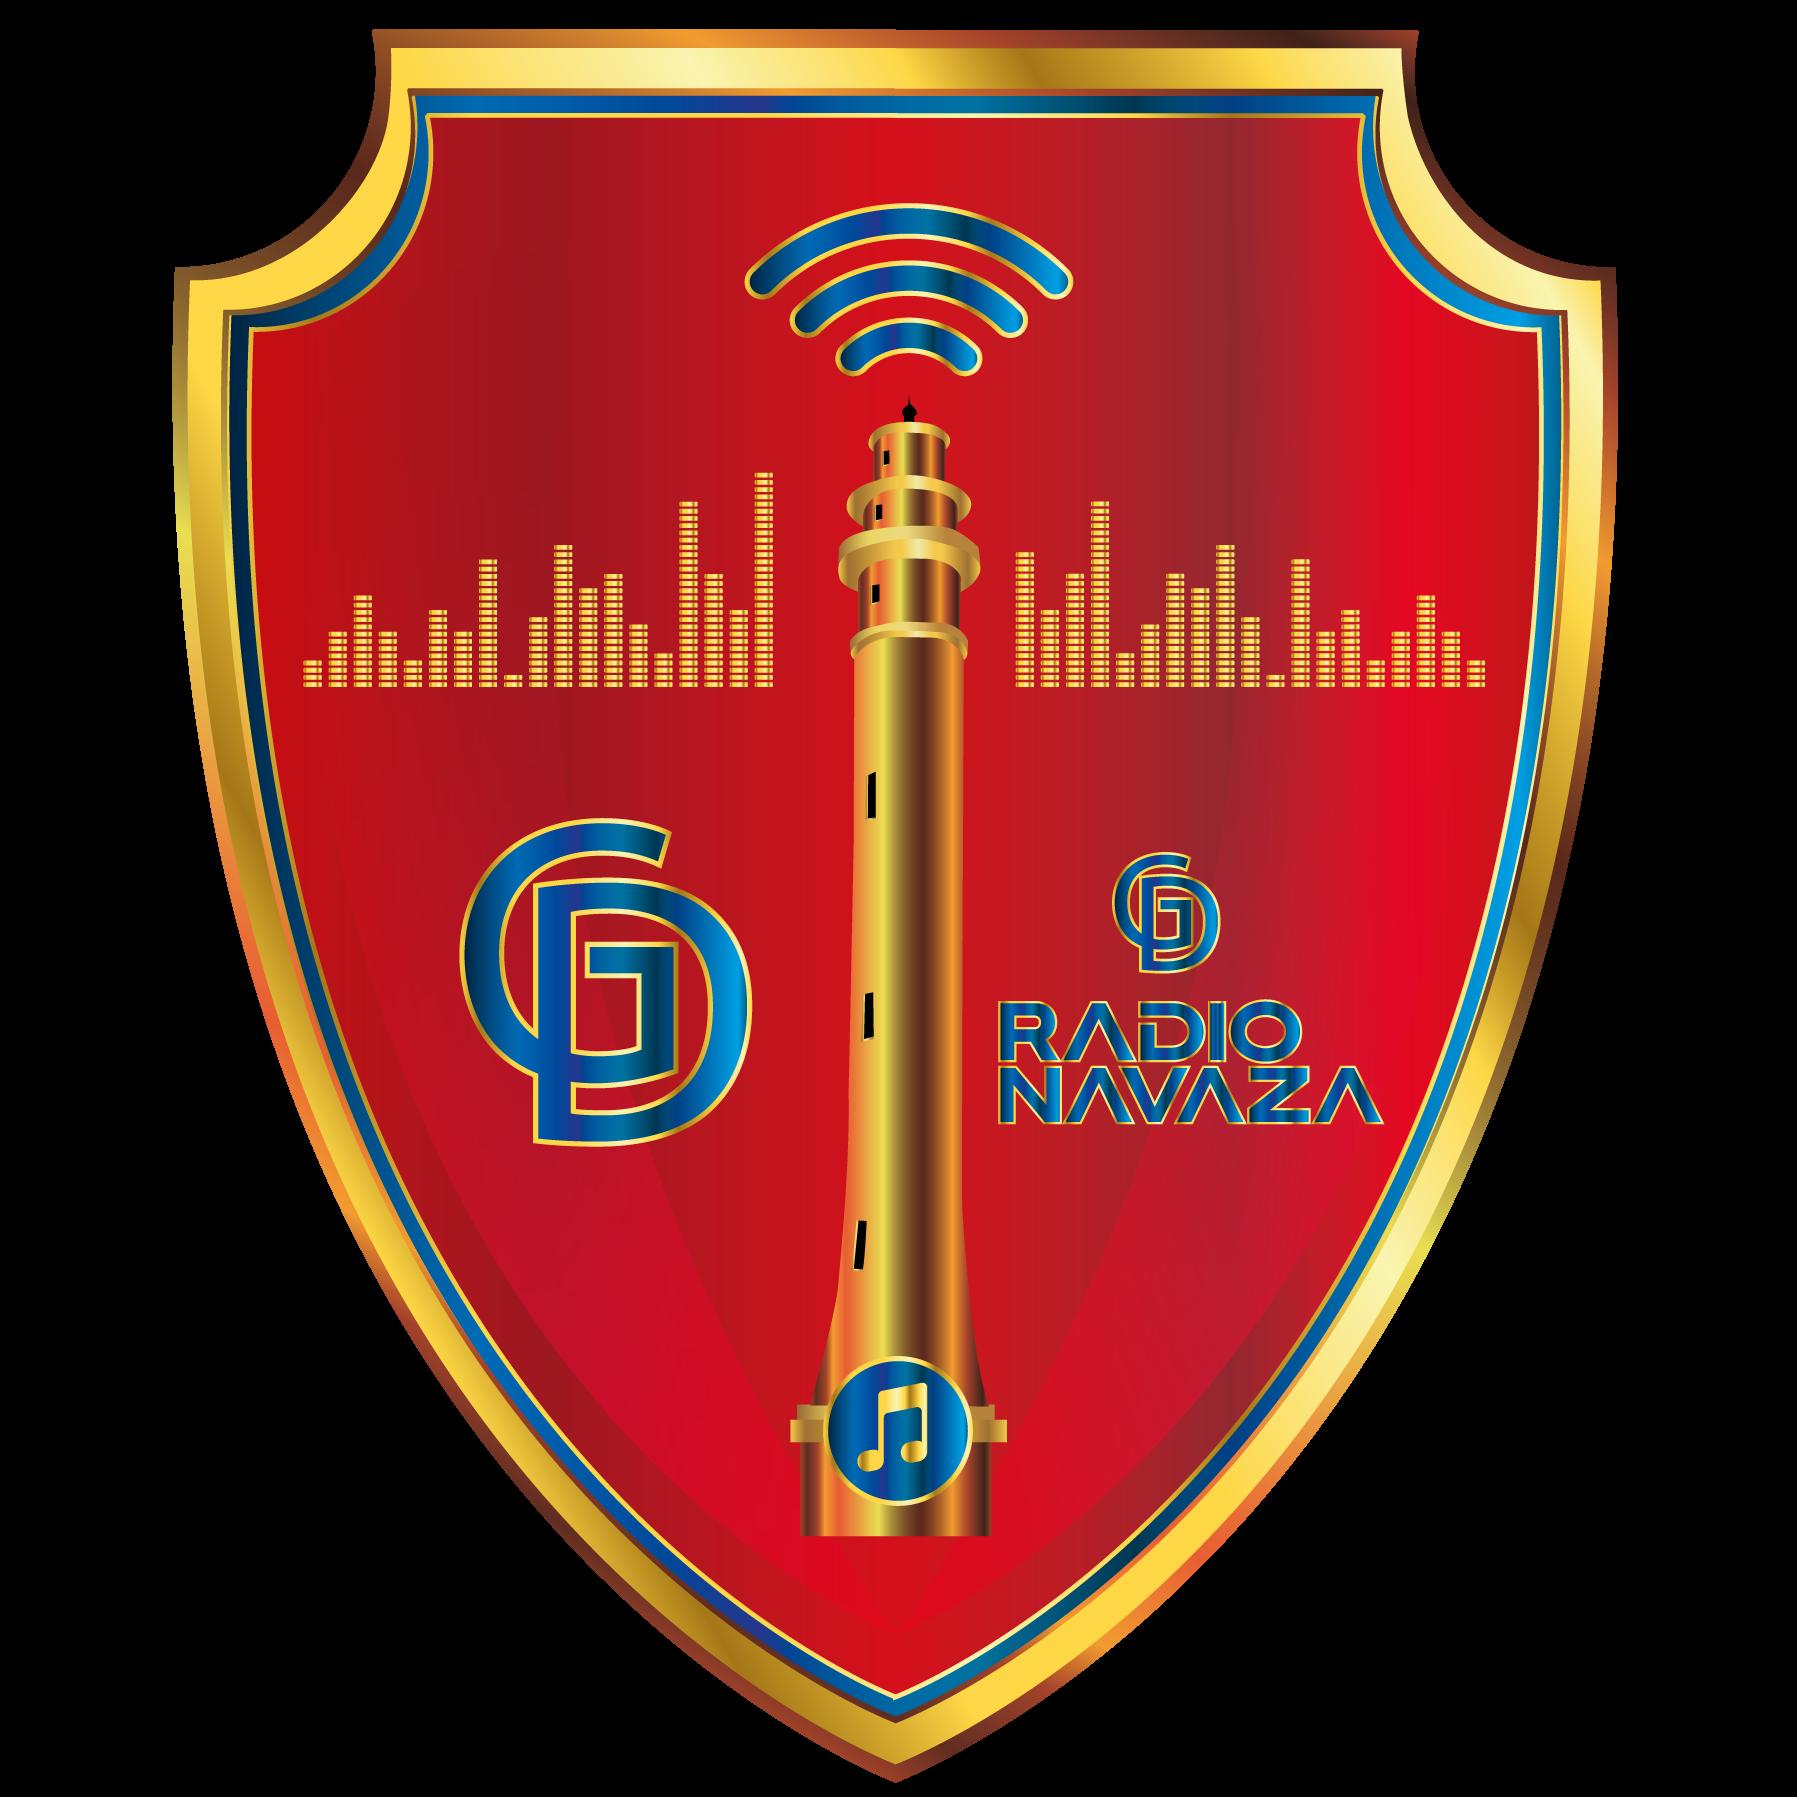 GD Radio Navaza